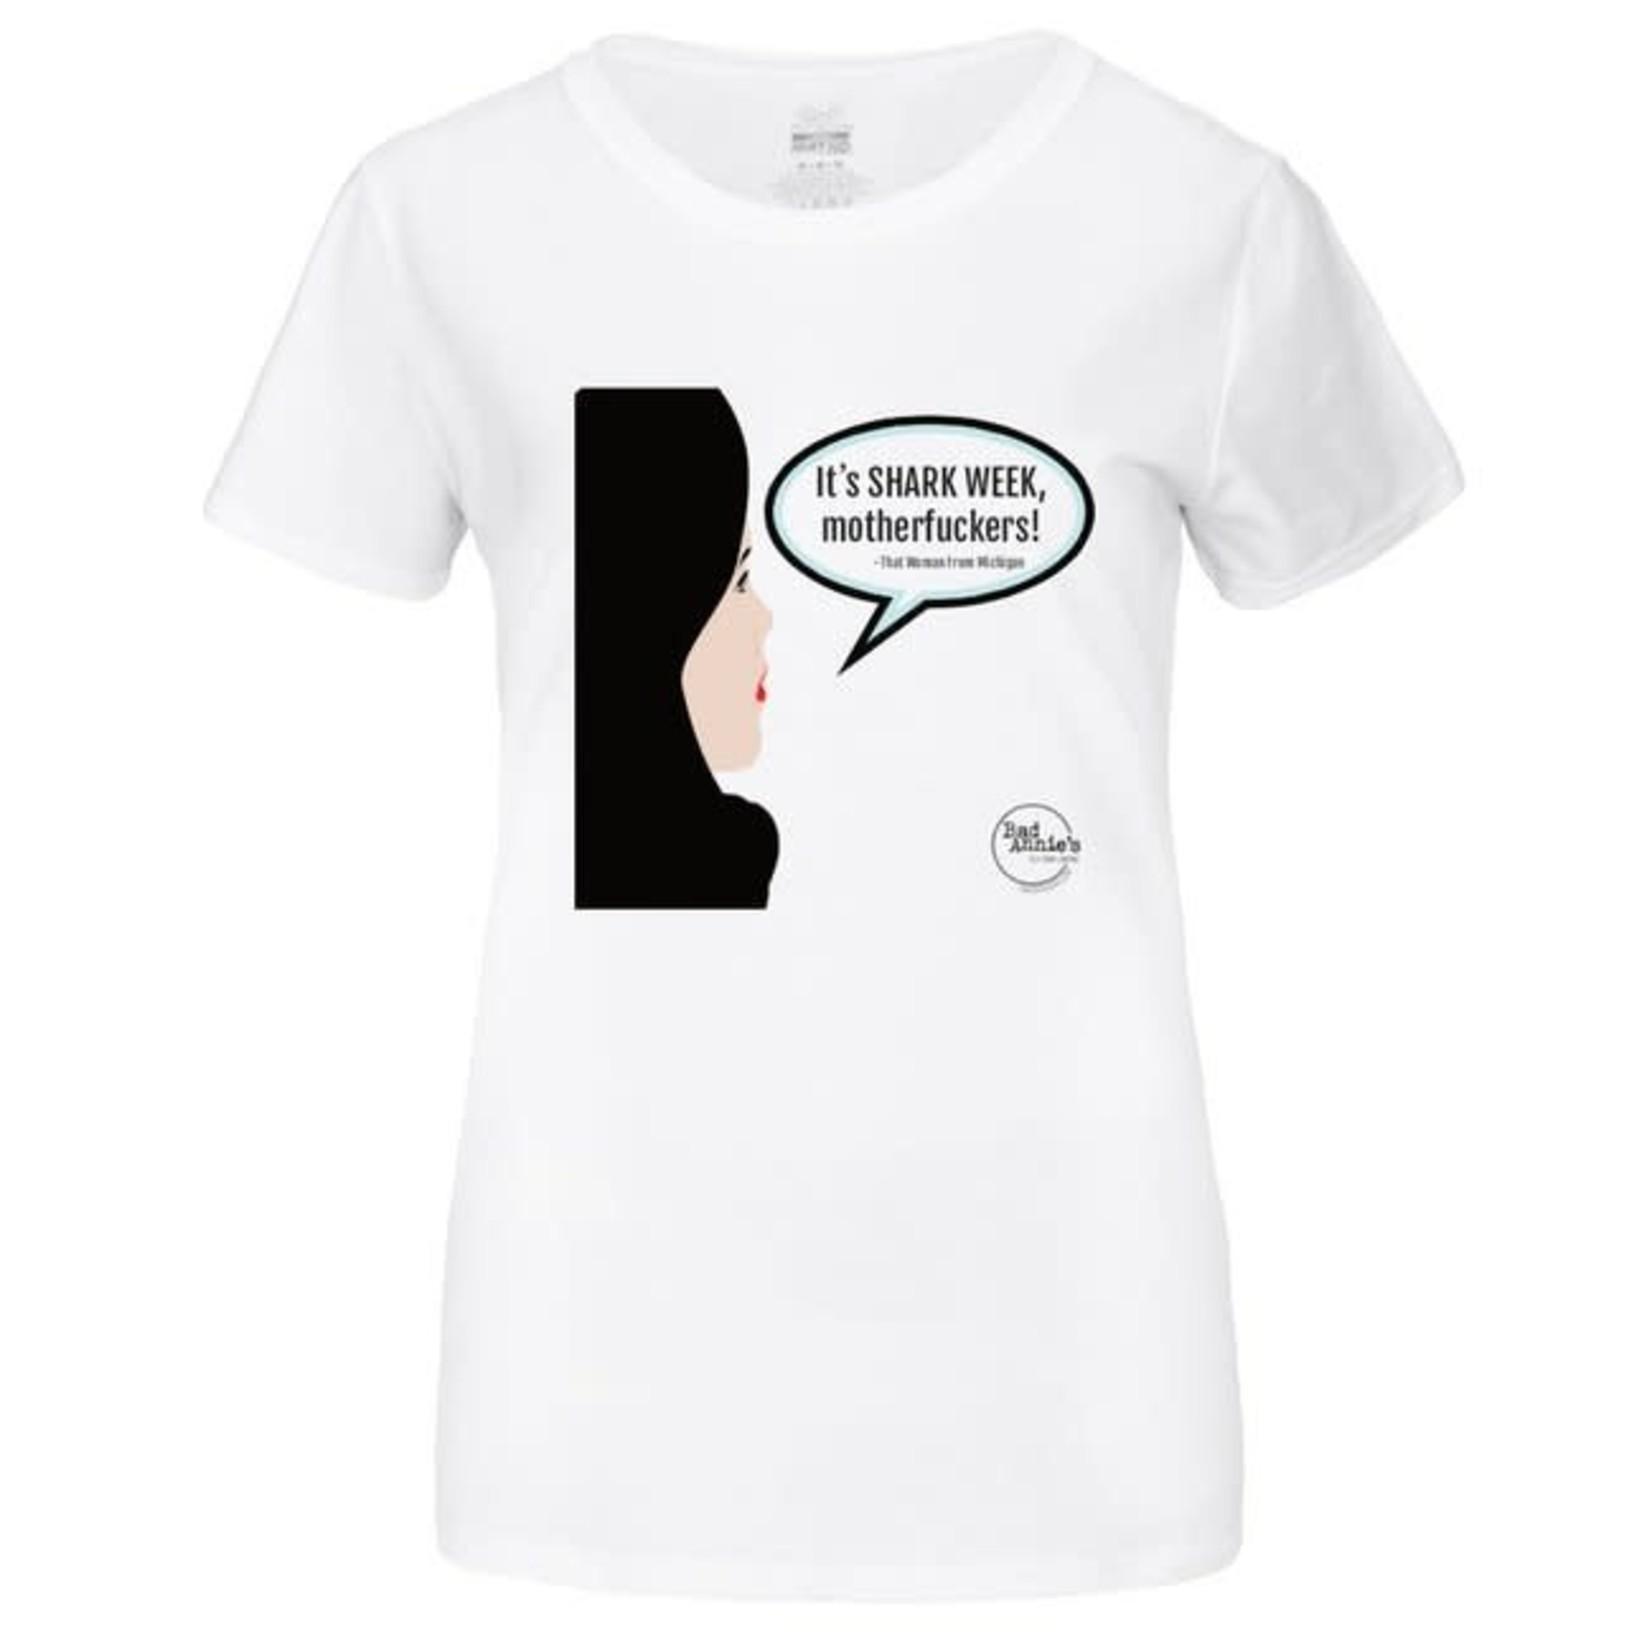 Bad Annie's T-Shirt - It's Shark Week Motherfuckers